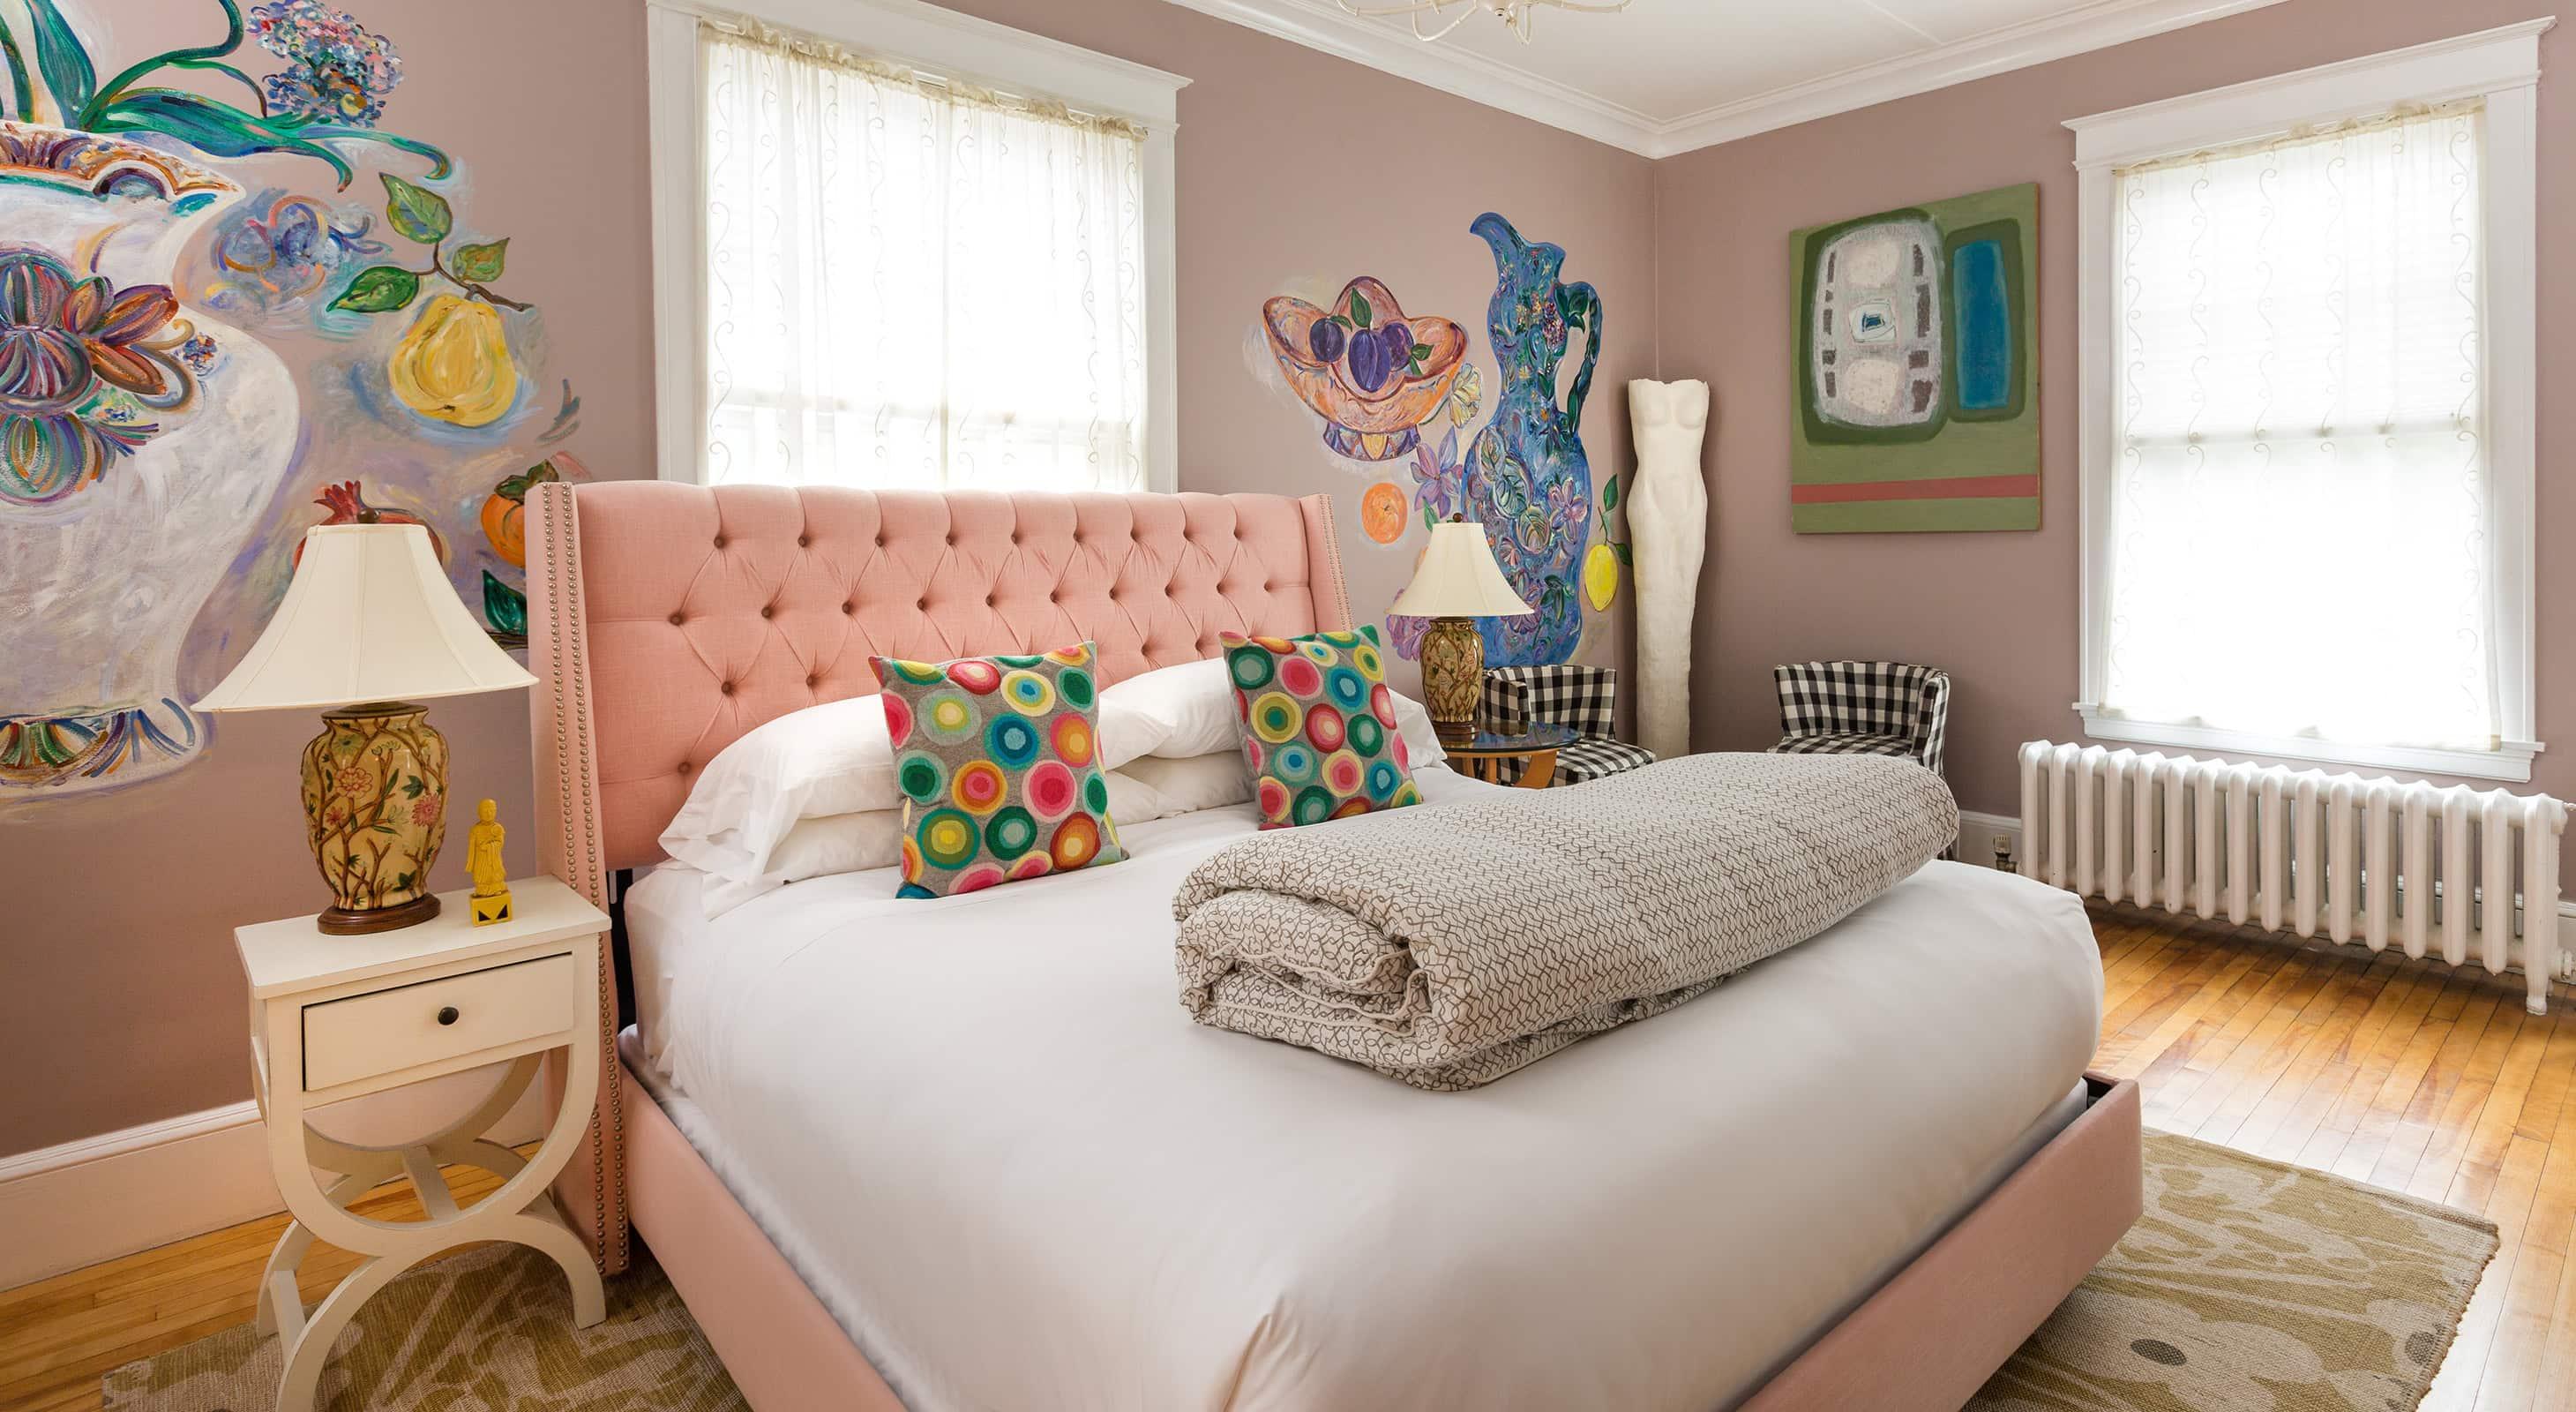 Milliken Suite for lodging in Portland Maine